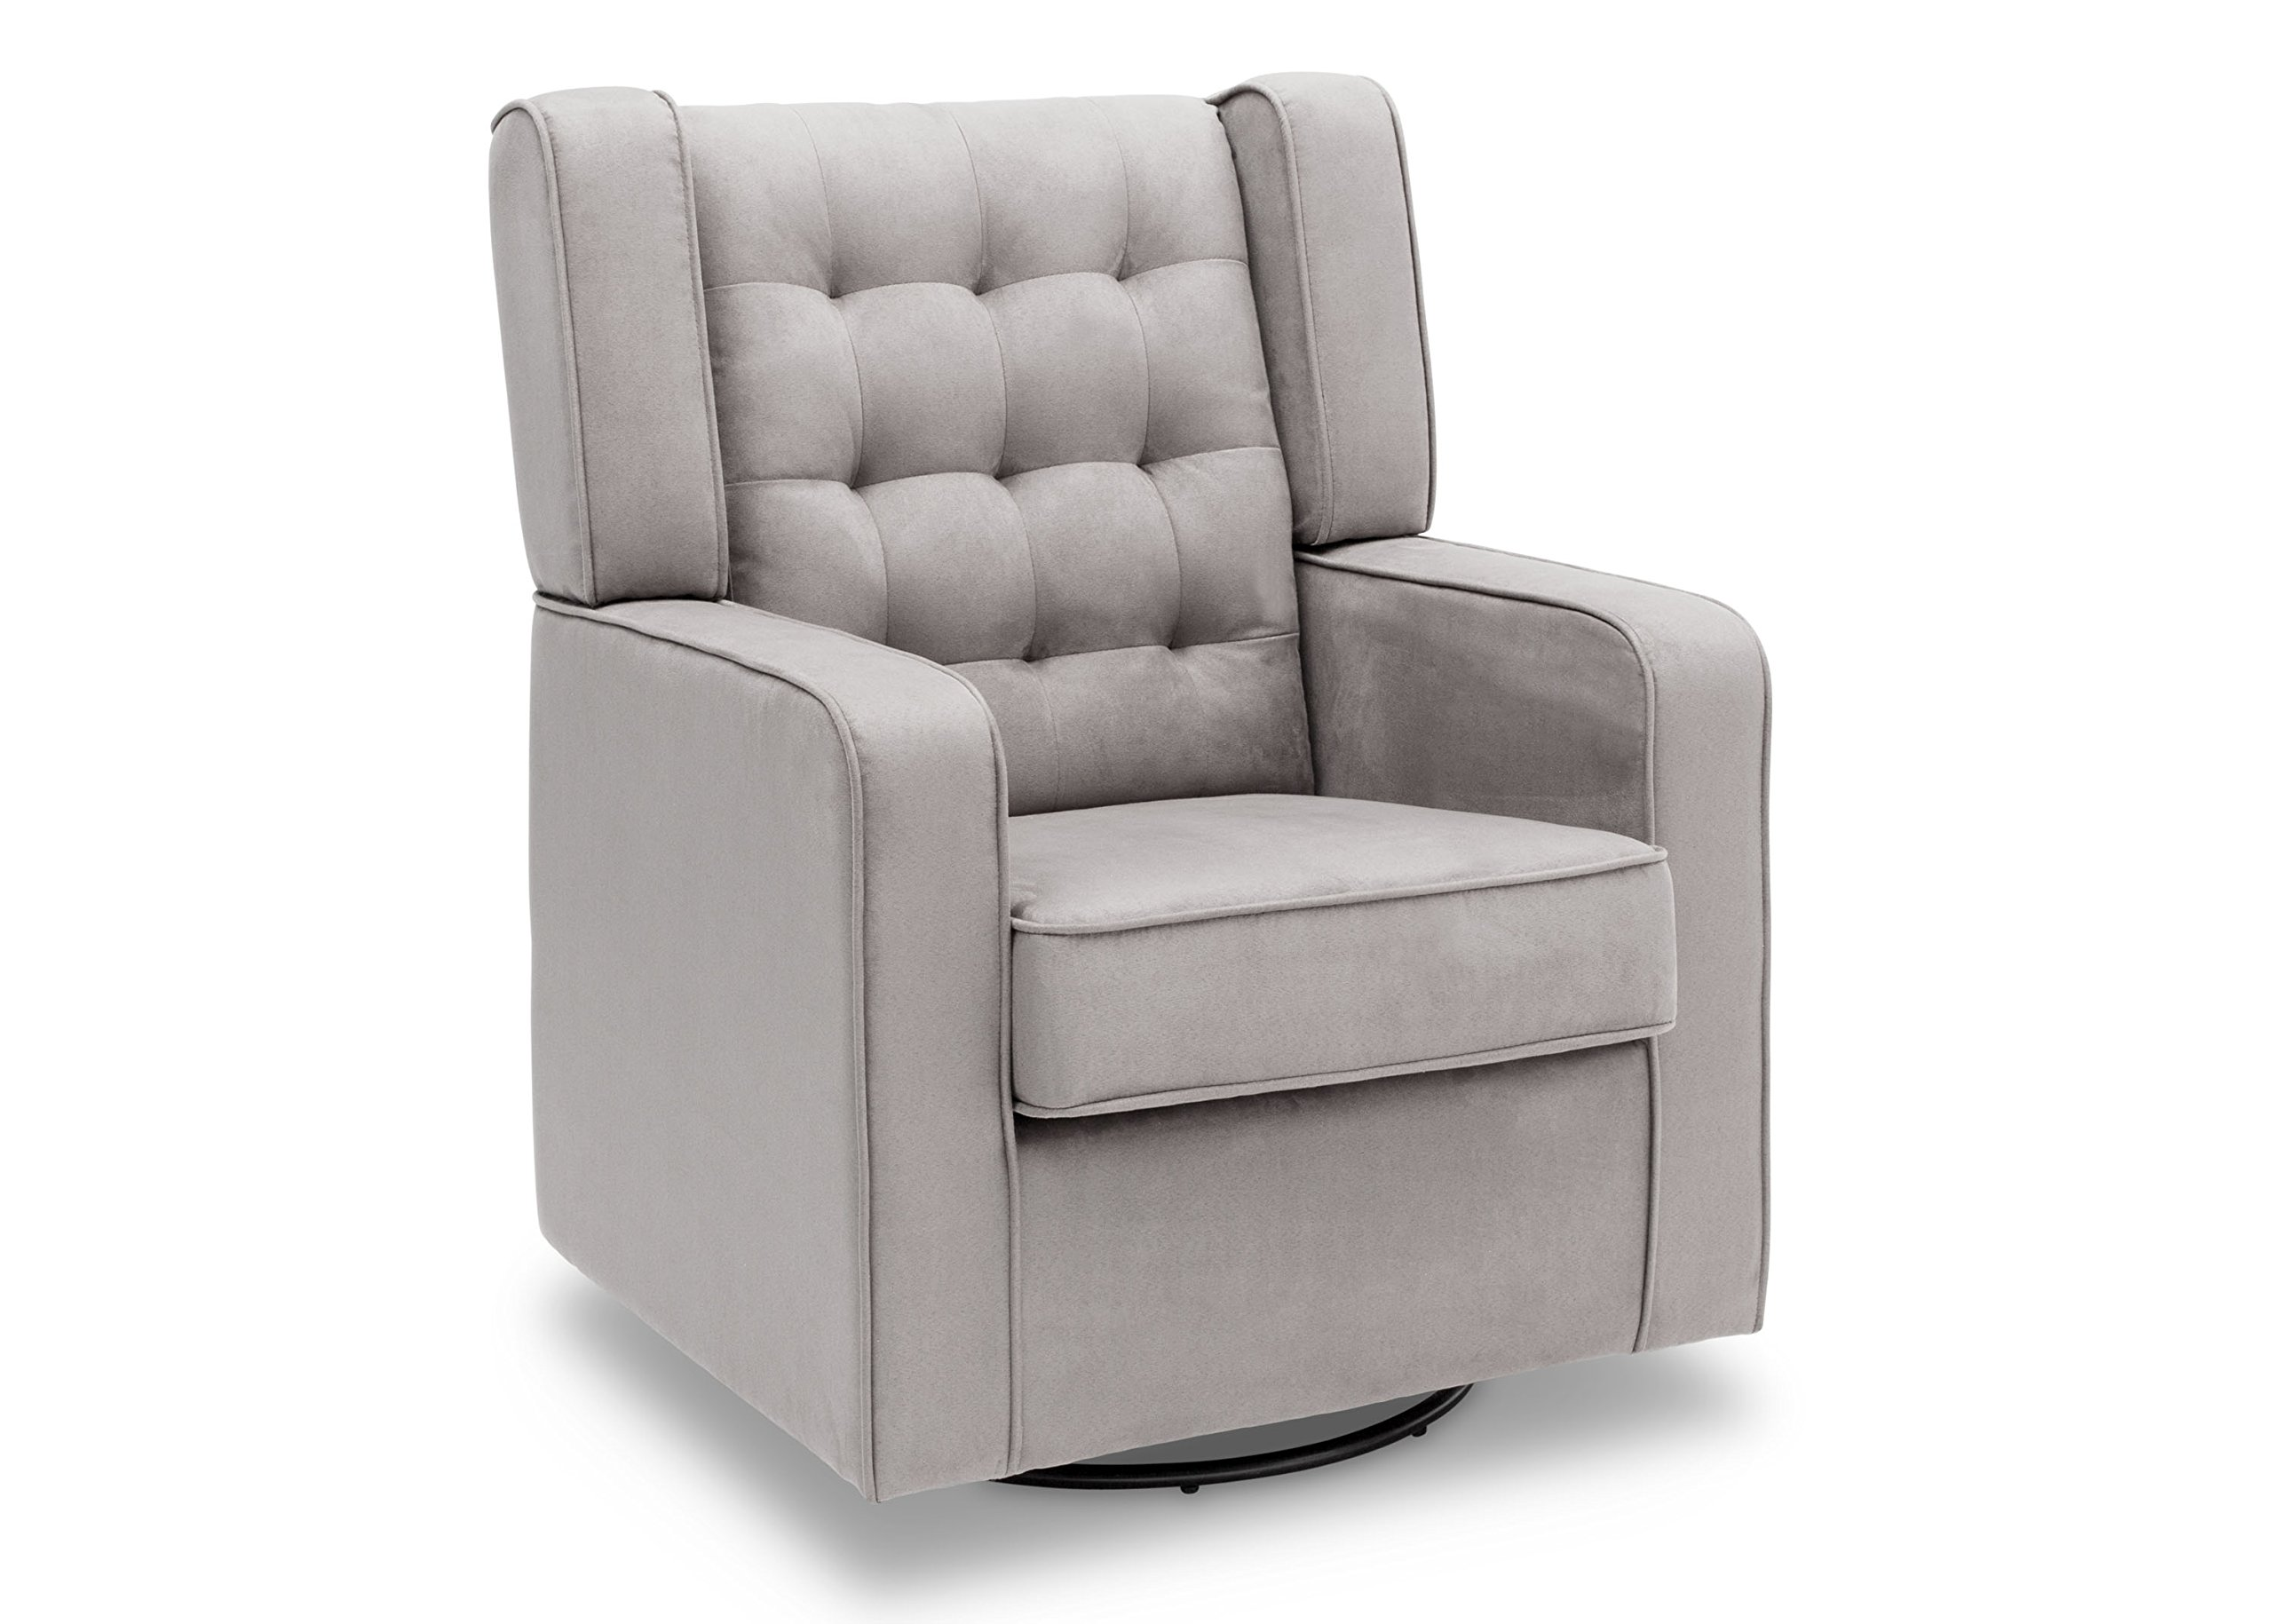 Delta Furniture Paris Upholstered Glider Swivel Rocker Chair, Dove Grey